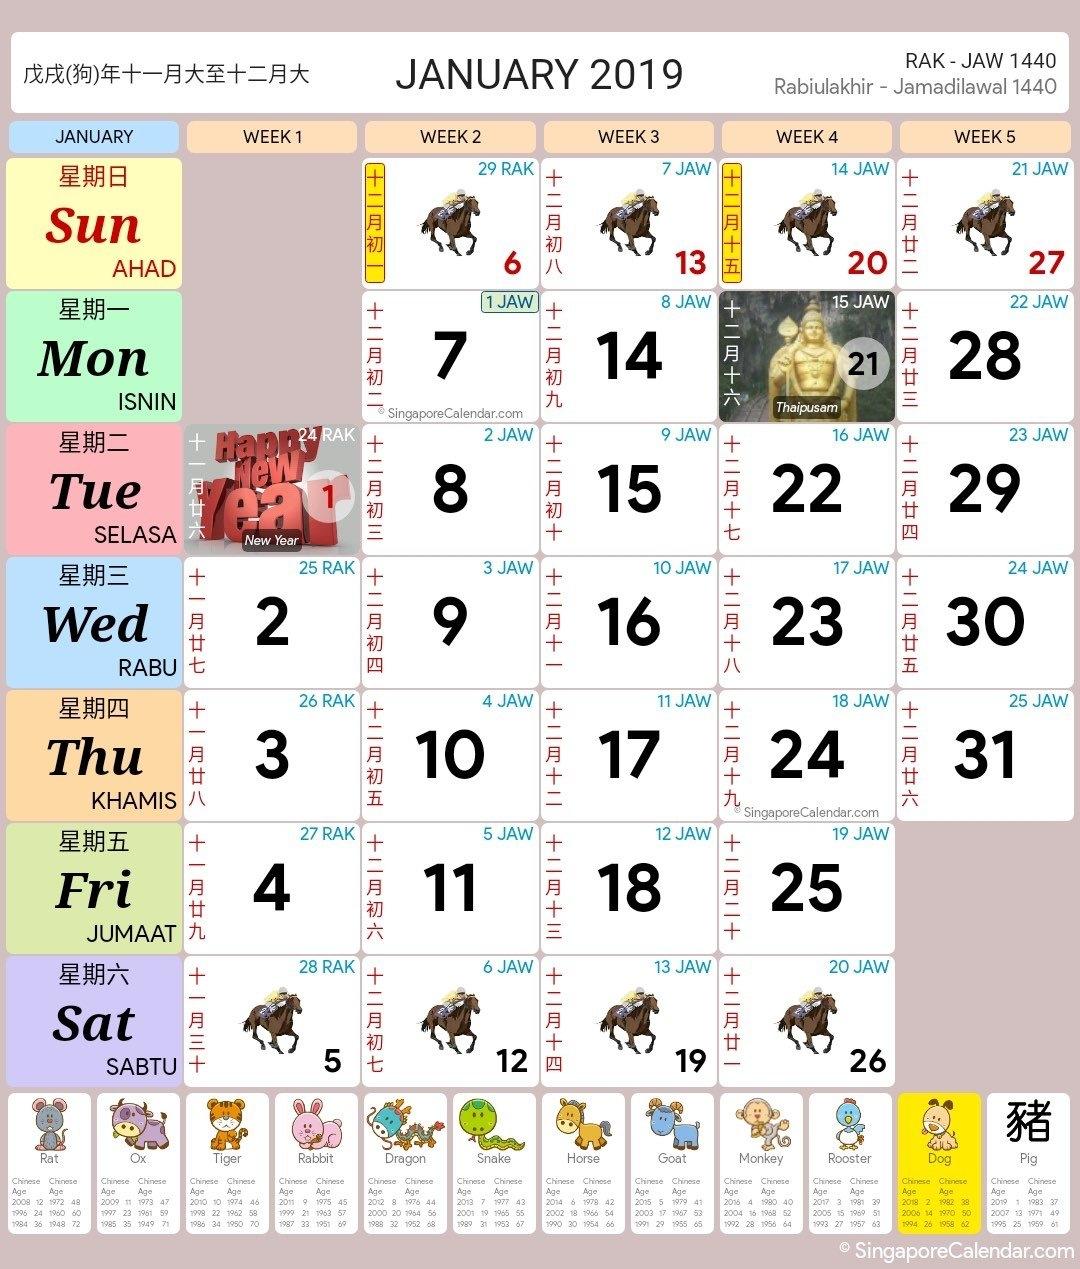 Singapore Calendar Year 2019 - Singapore Calendar Calendar 01/2019